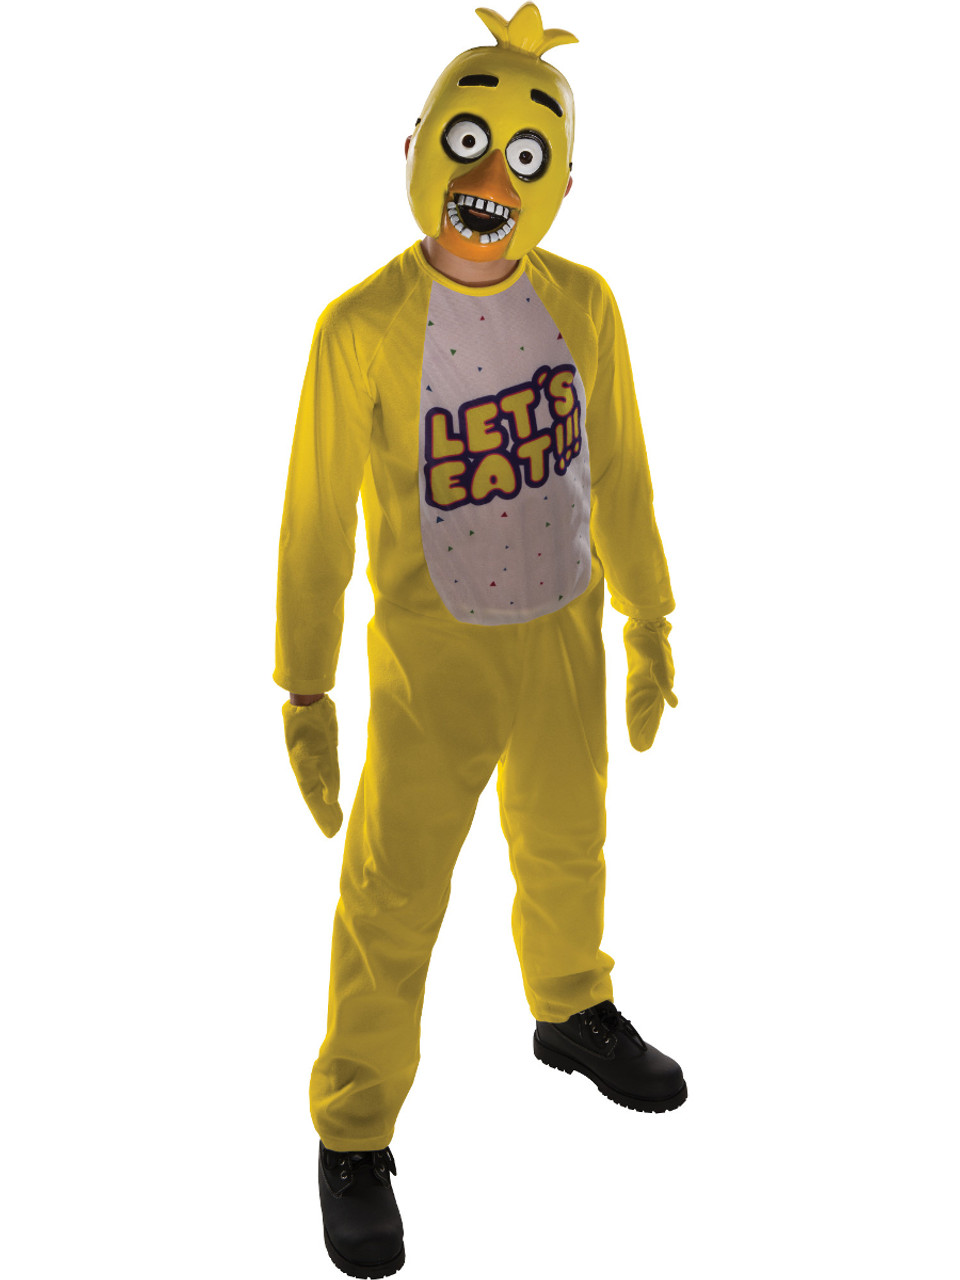 Boy's Five Nights At Freddy's Chica Costume Tween 14-16